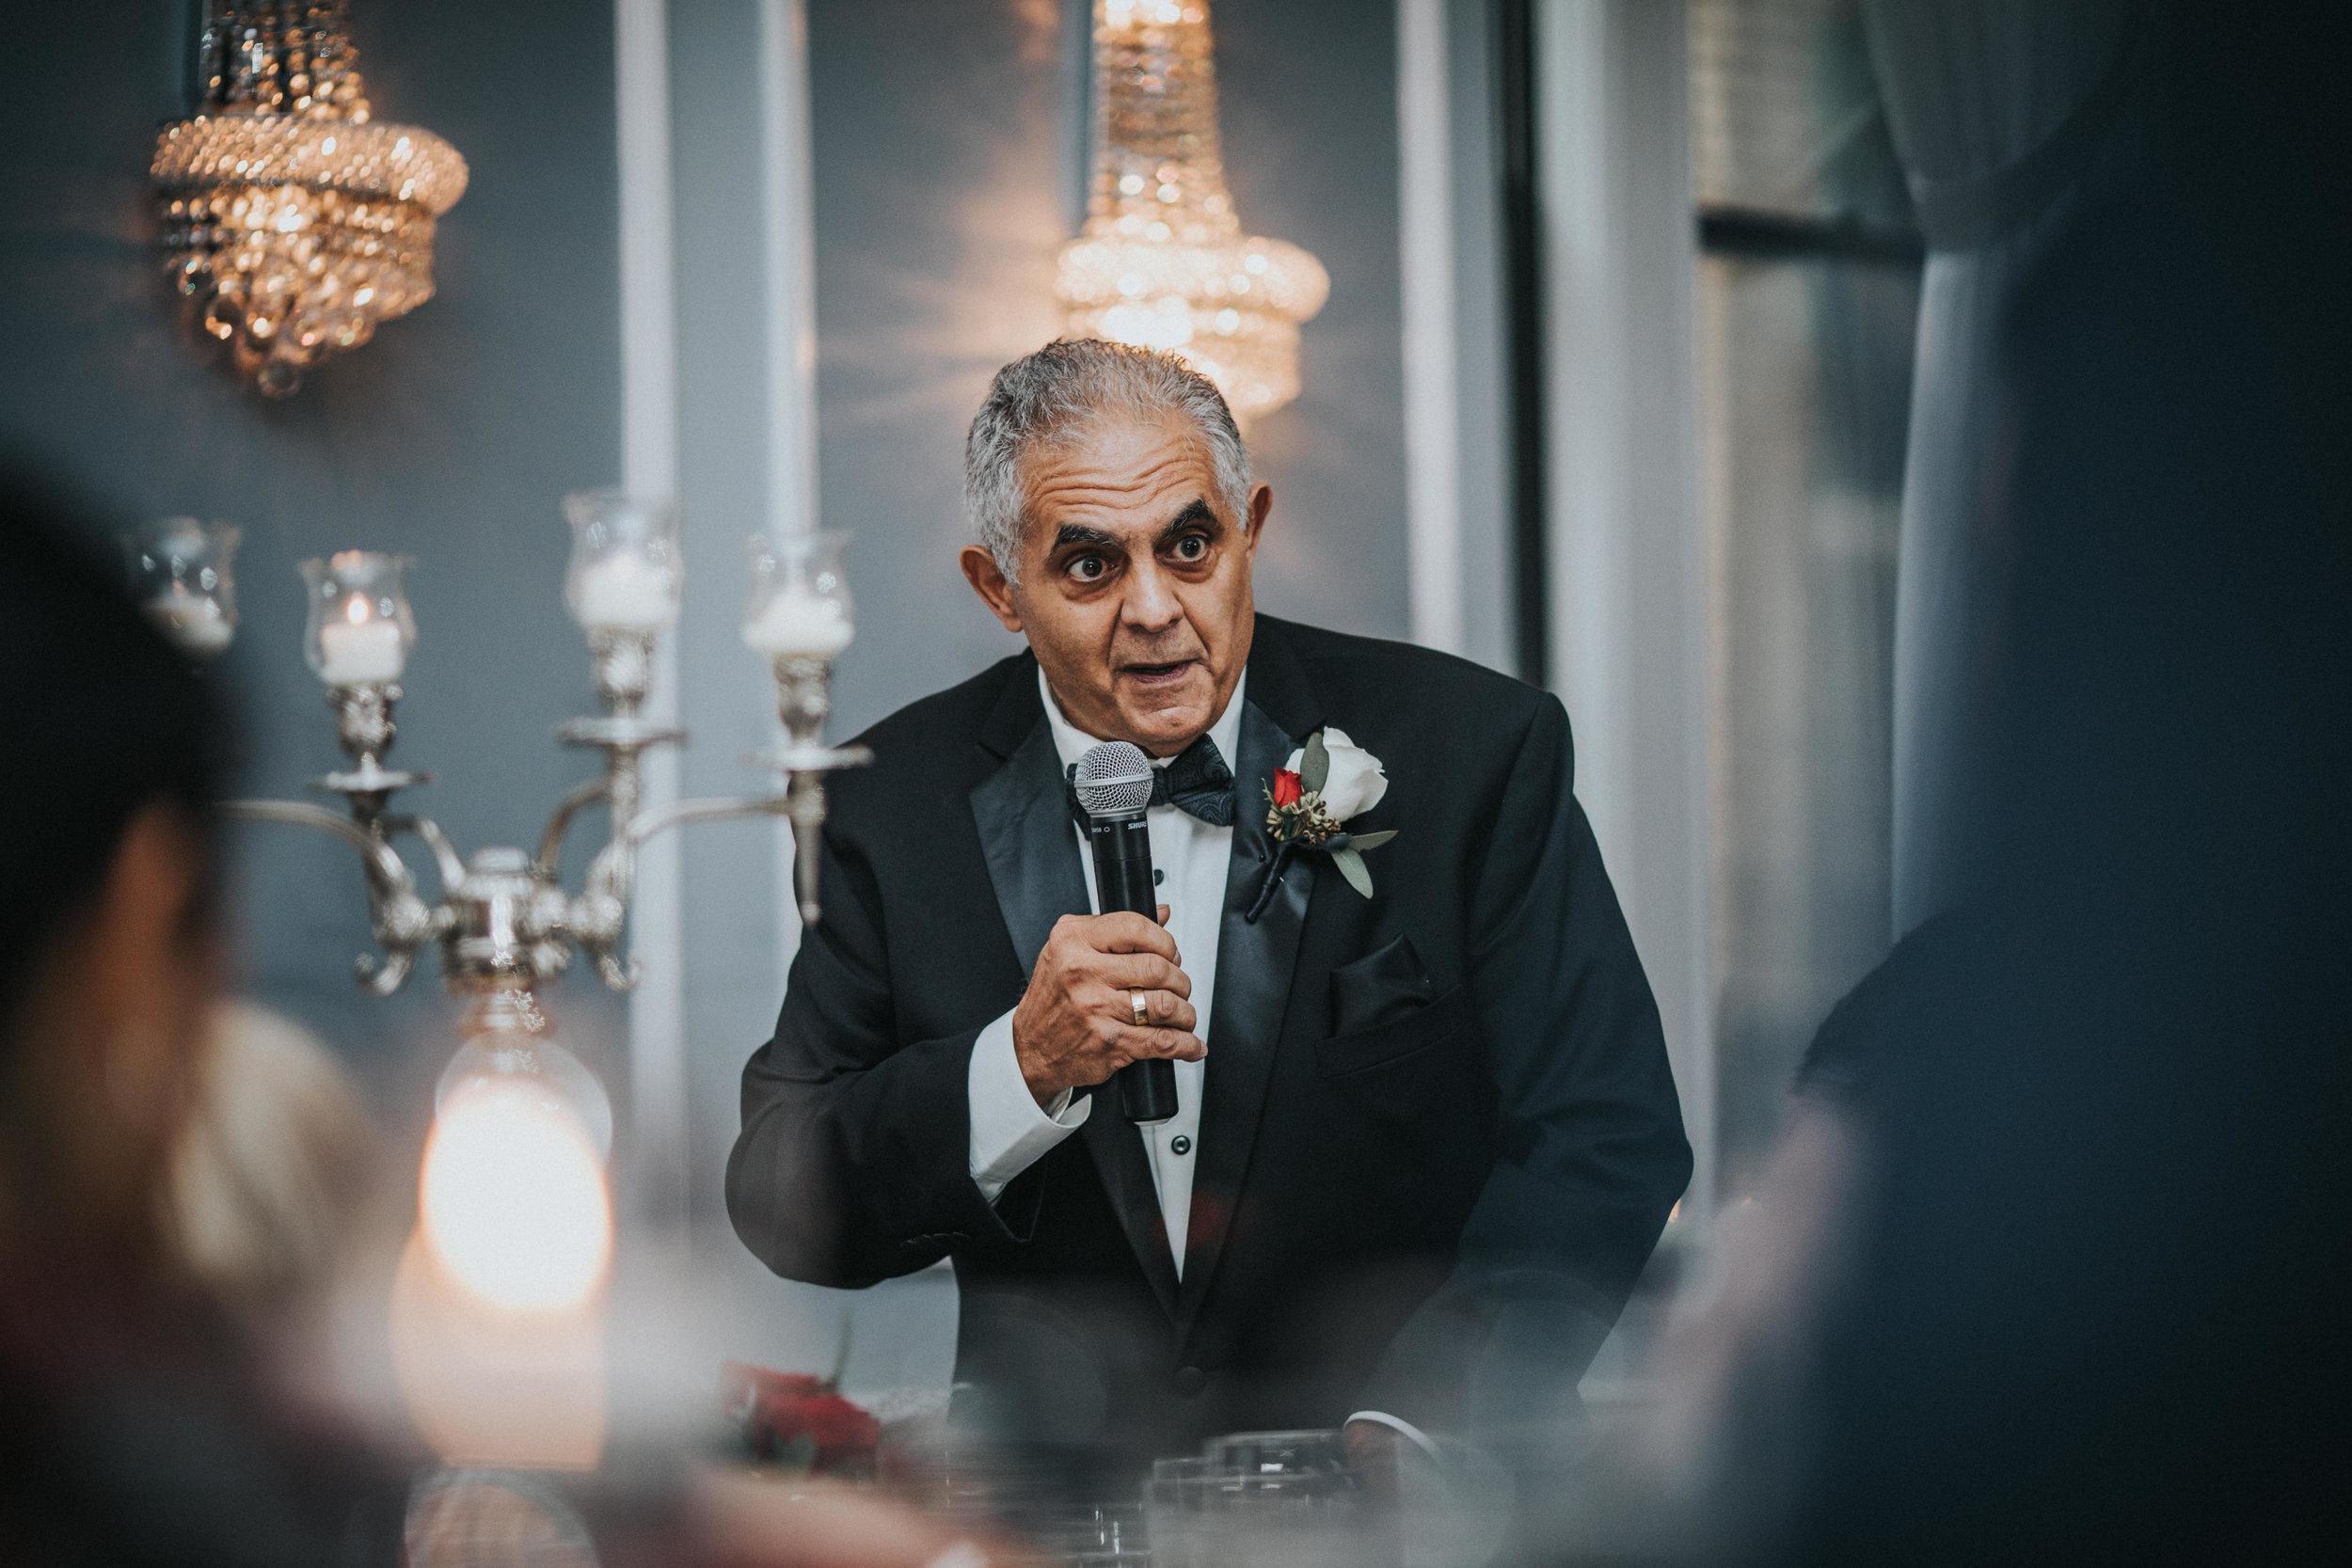 JennaLynnPhotography-NJWeddingPhotographer-Philadelphia-Wedding-ArtsBallroom-Reception-27.jpg